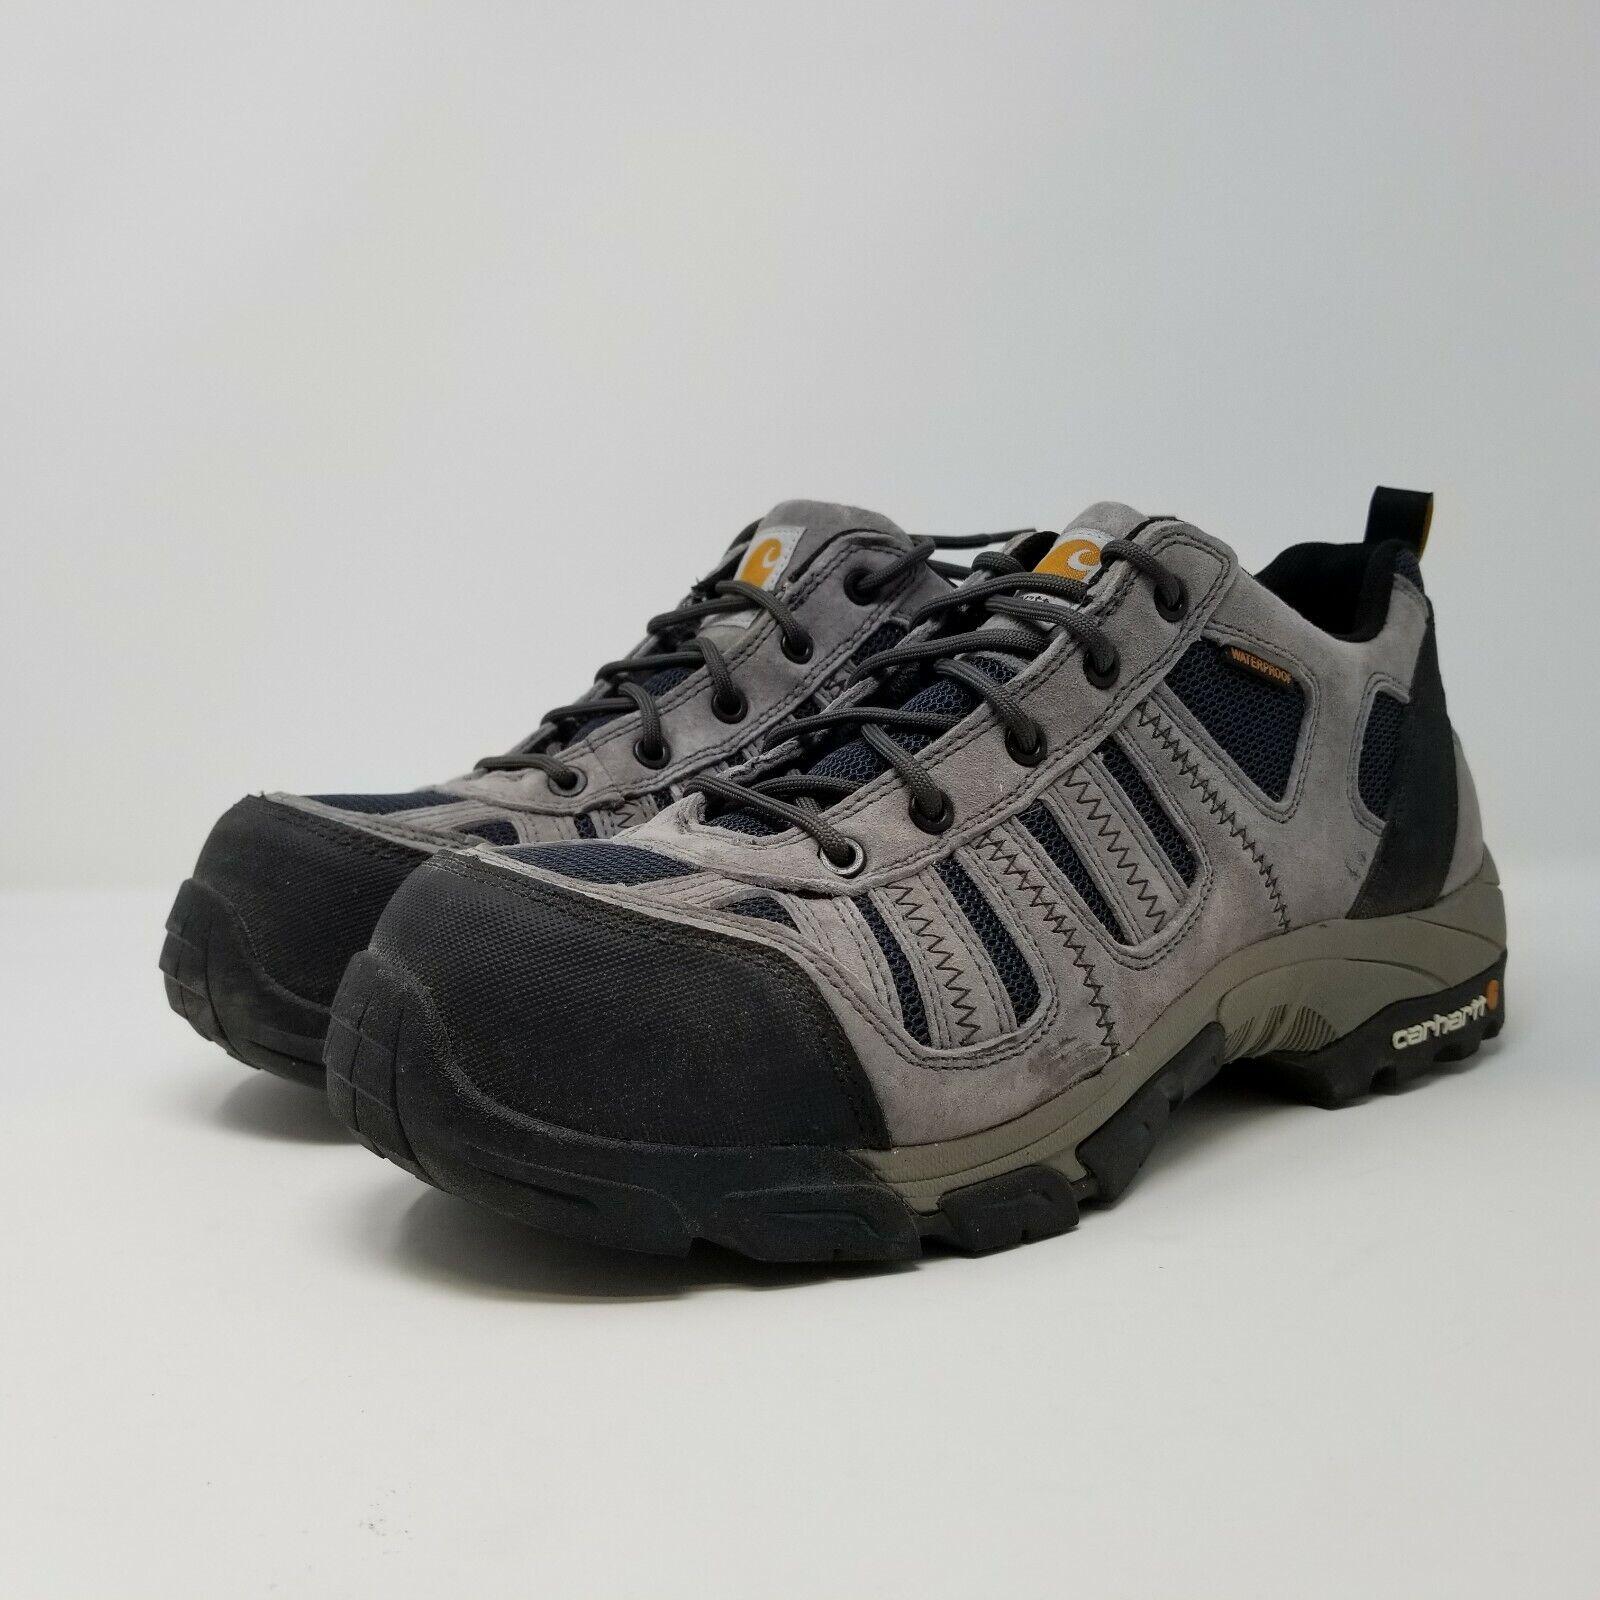 botas para hombre Composite Toe Carhartt US 11.5 Ante gris Azul Marino Nylon CMO3356